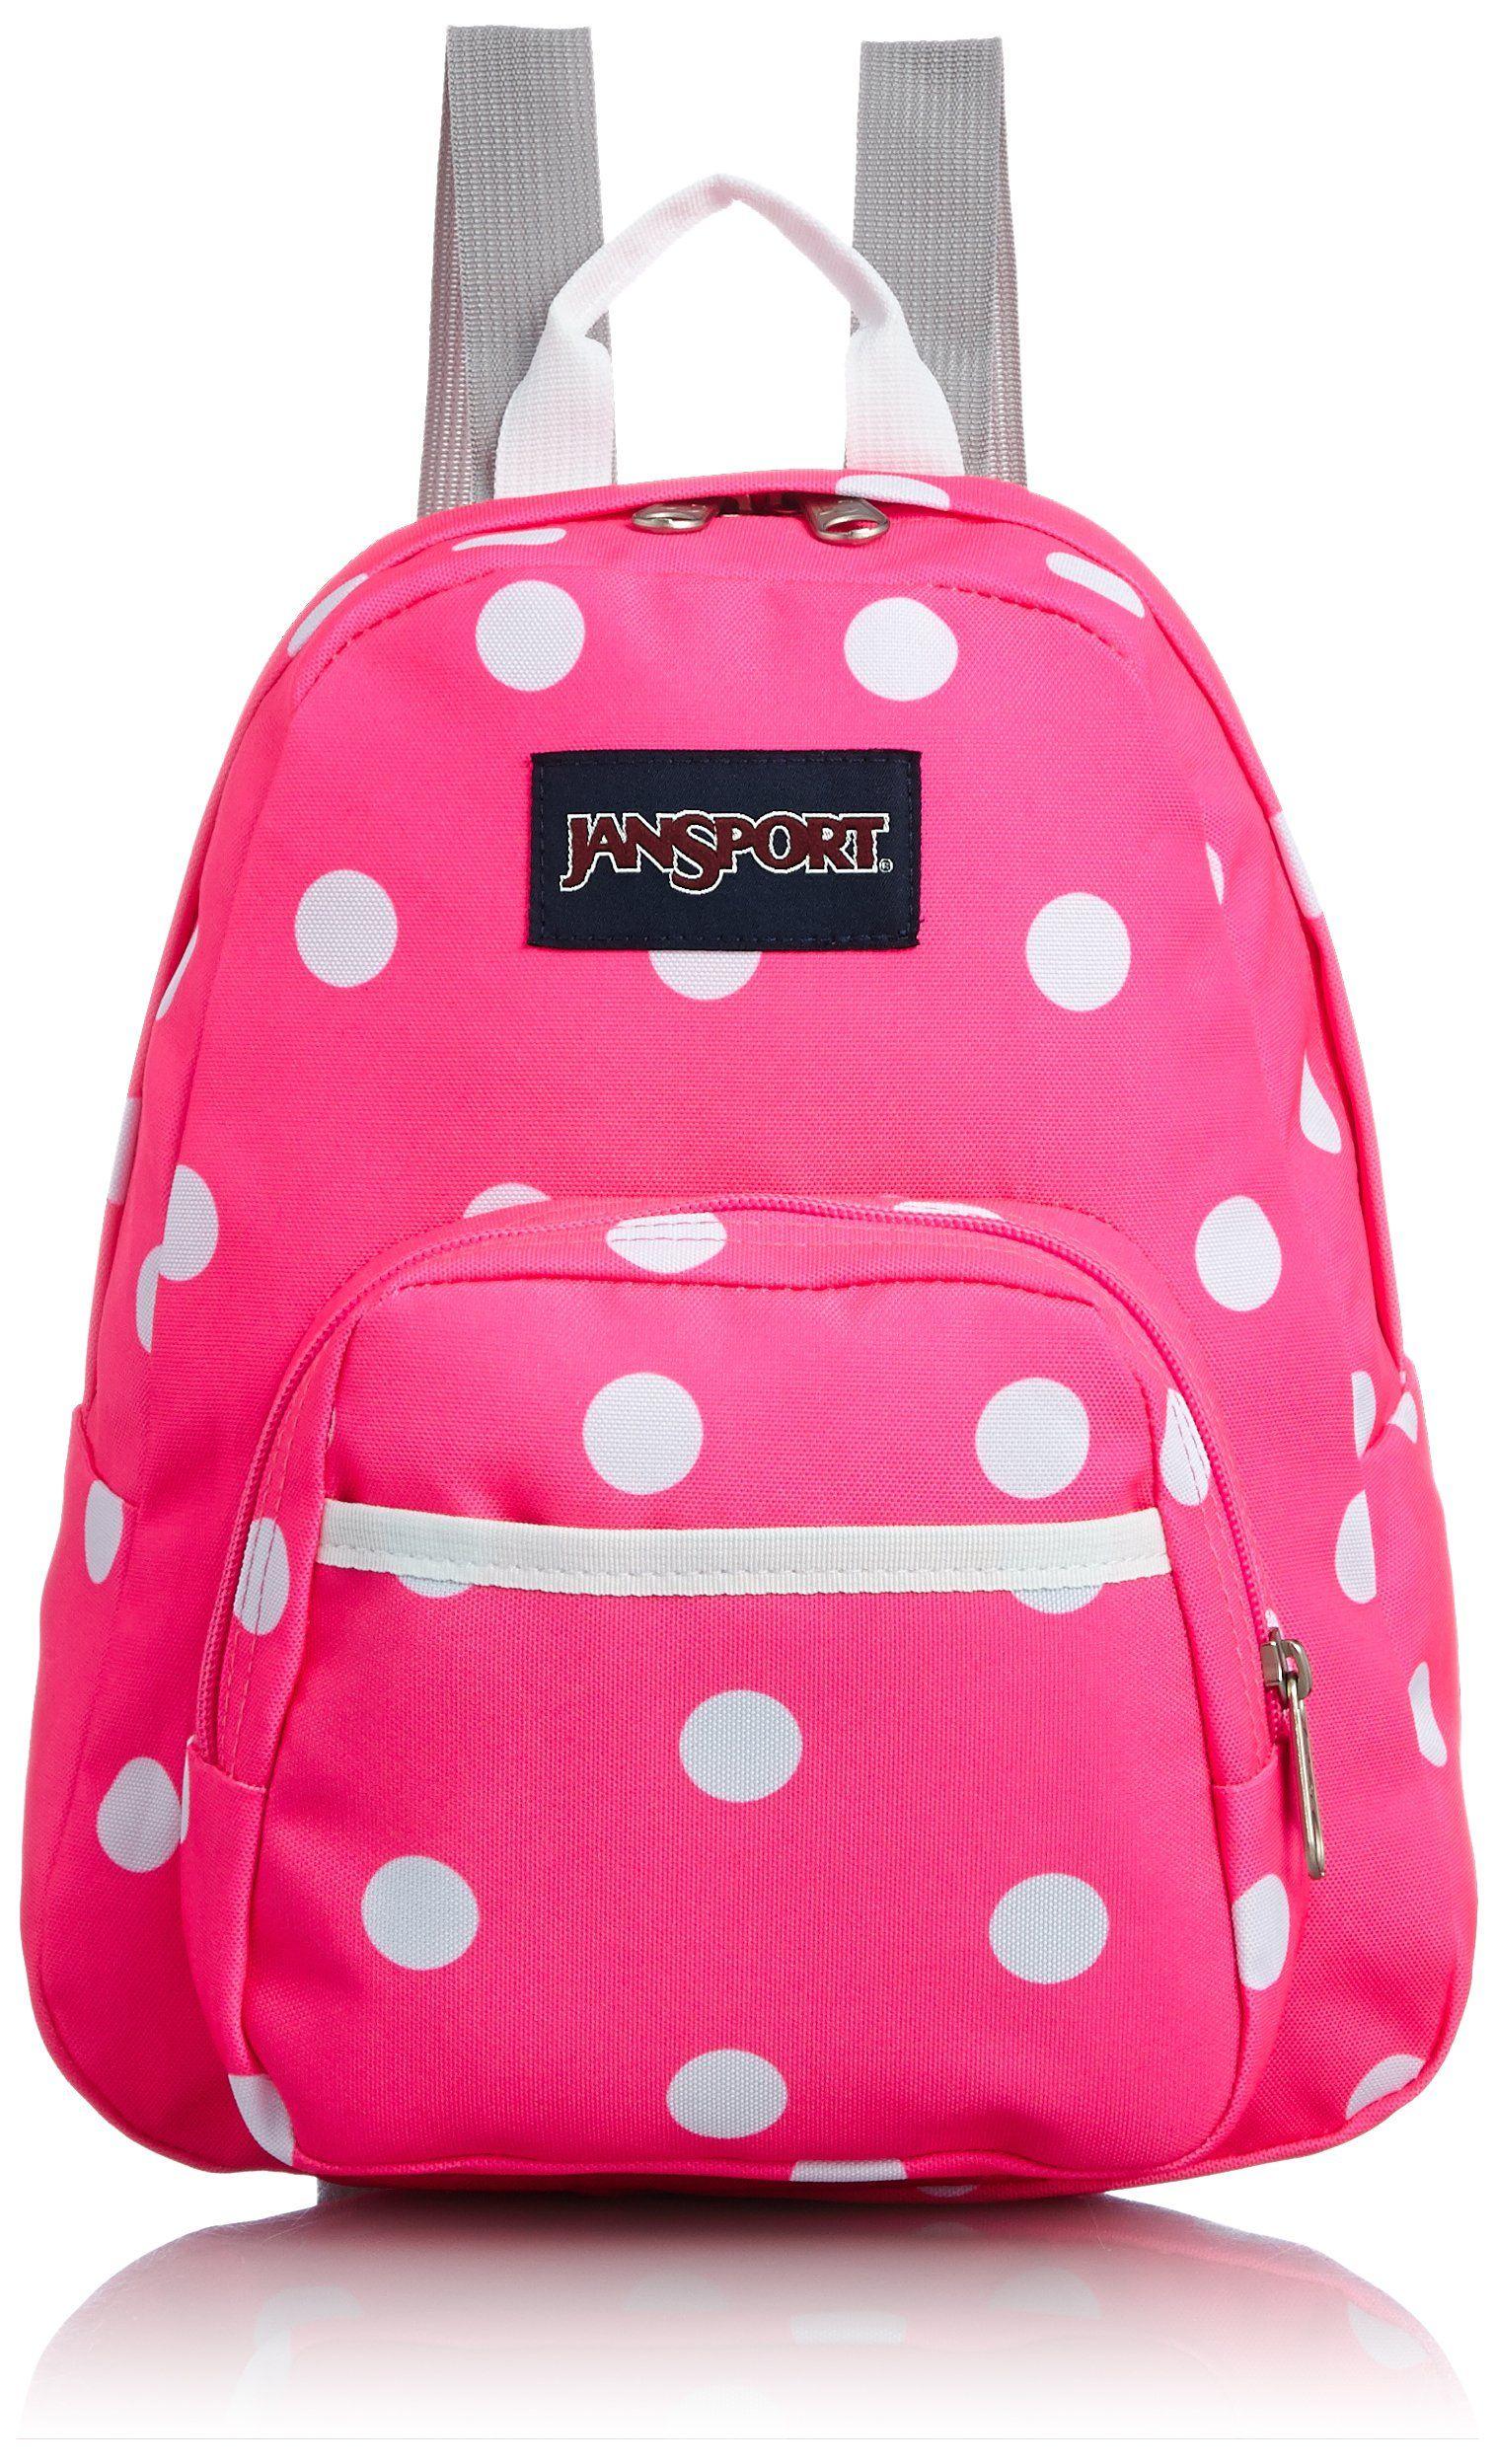 Amazon.com: Jansport Half Pint Backpack (Black): Clothing | Gift ...